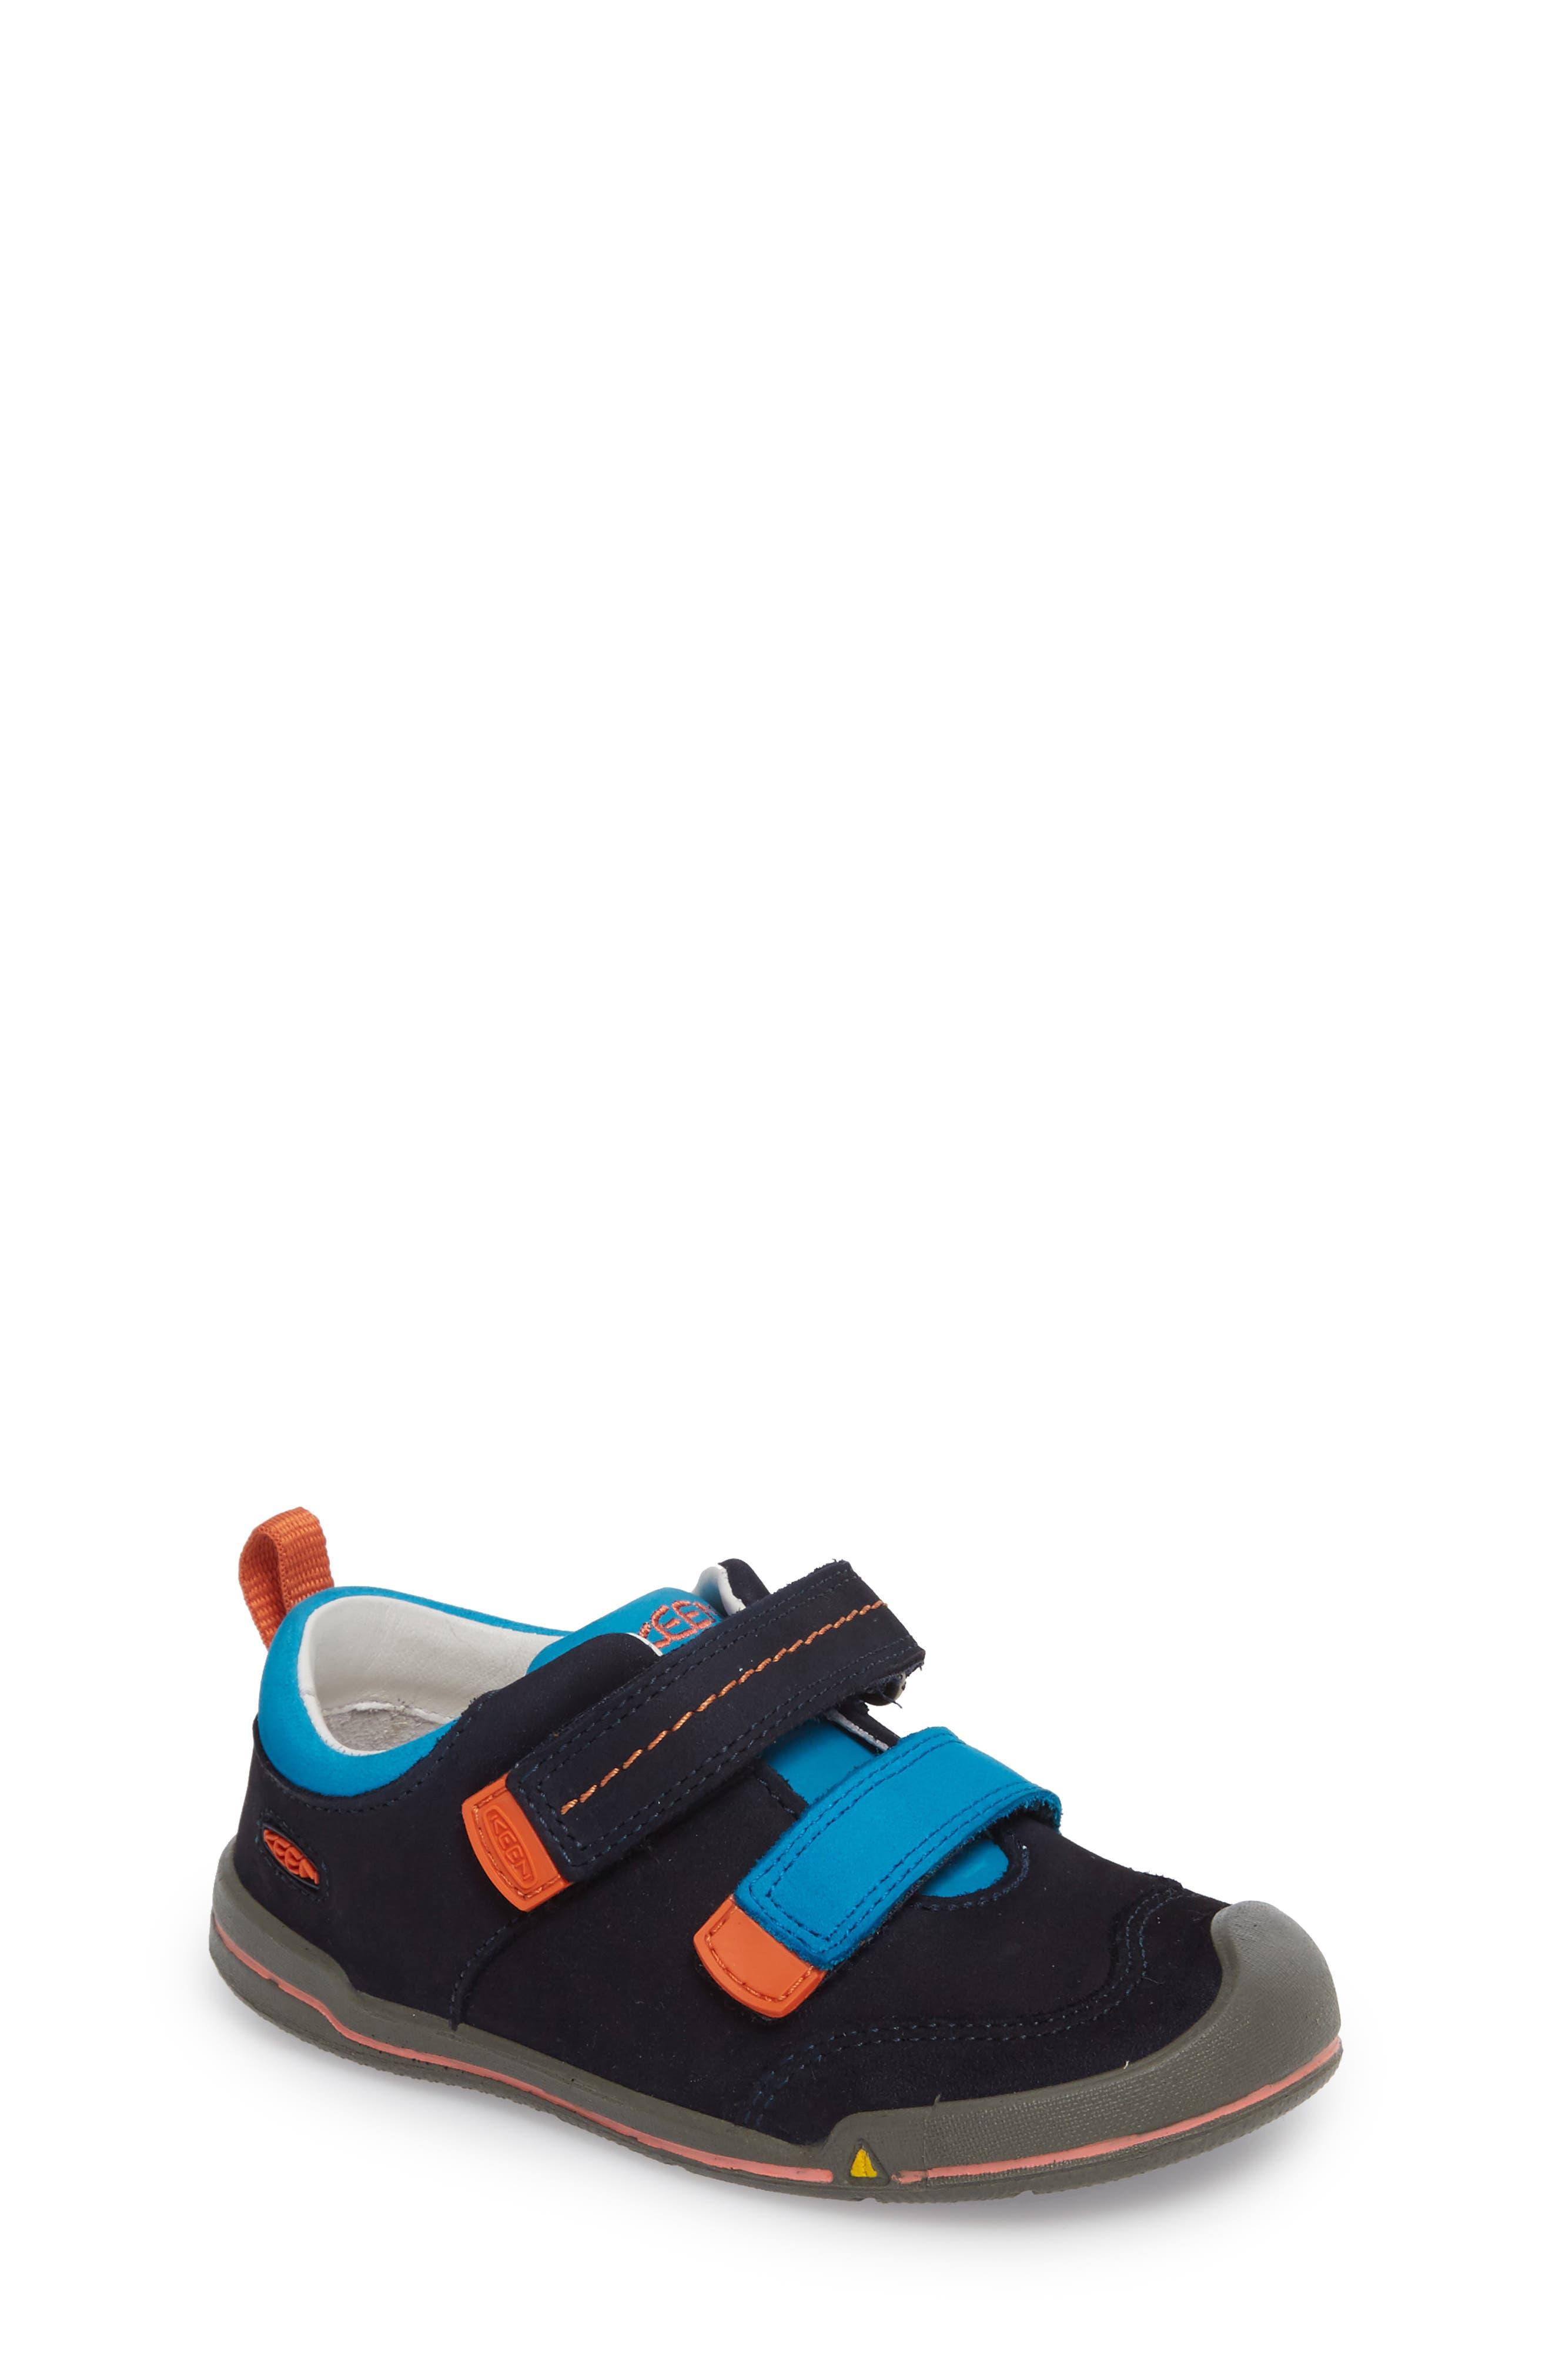 Sprout Double Strap Sneaker,                         Main,                         color, DRESS BLUES/ KOI